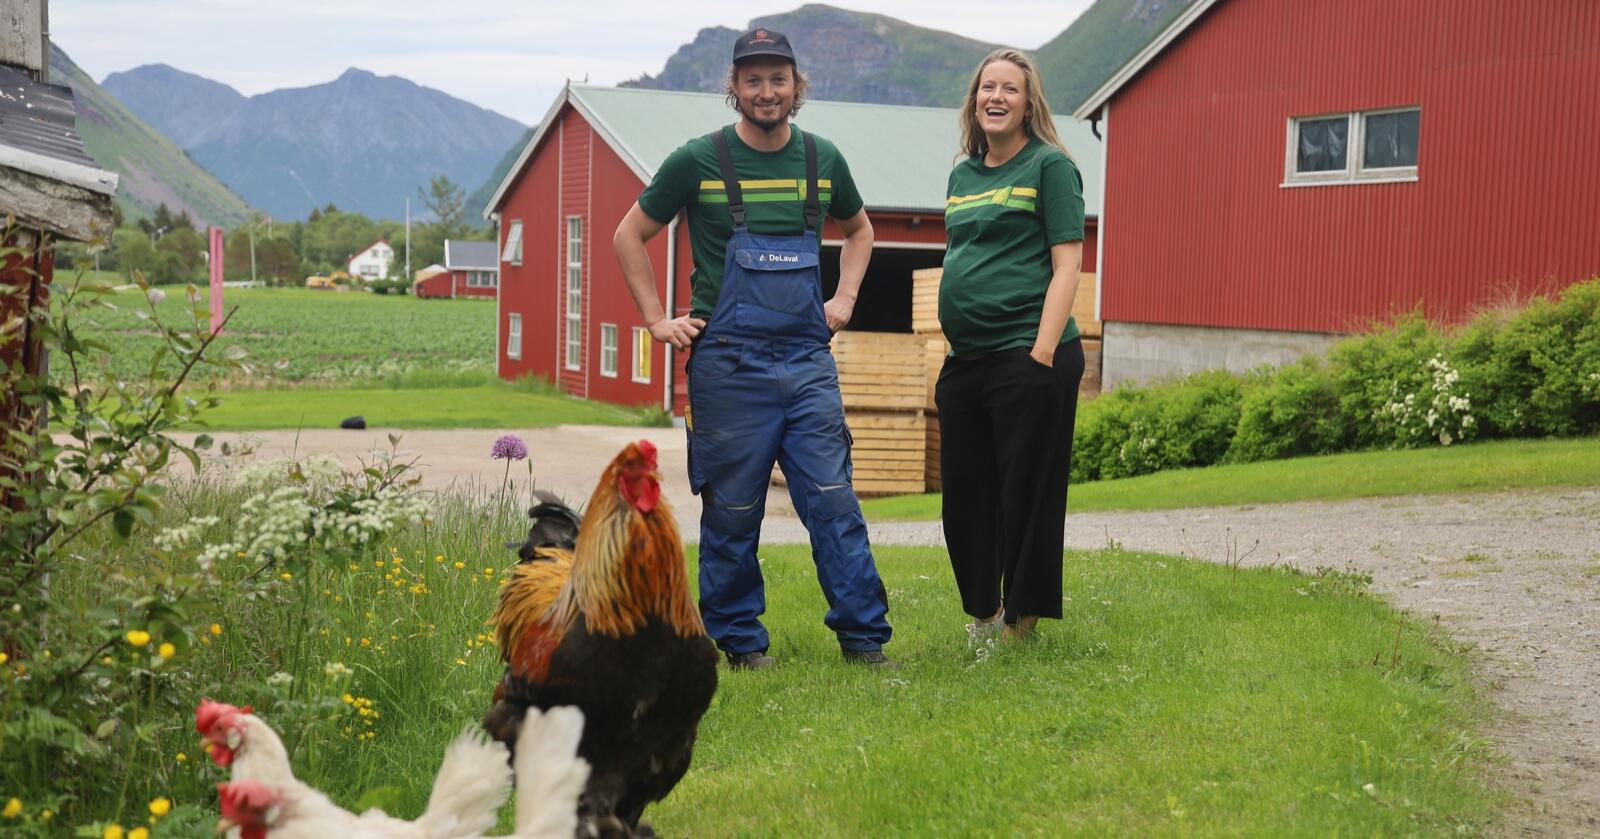 VINNERE: Dina Fonn Sætre og Henning Andreas Holand fra Engeløya i Nordland ble kåret til årets unge bonde i 2020. Nå kjemper 17 nye, unge bønder om årets pris. Foto: Camilla Mellemstrand, Felleskjøpet